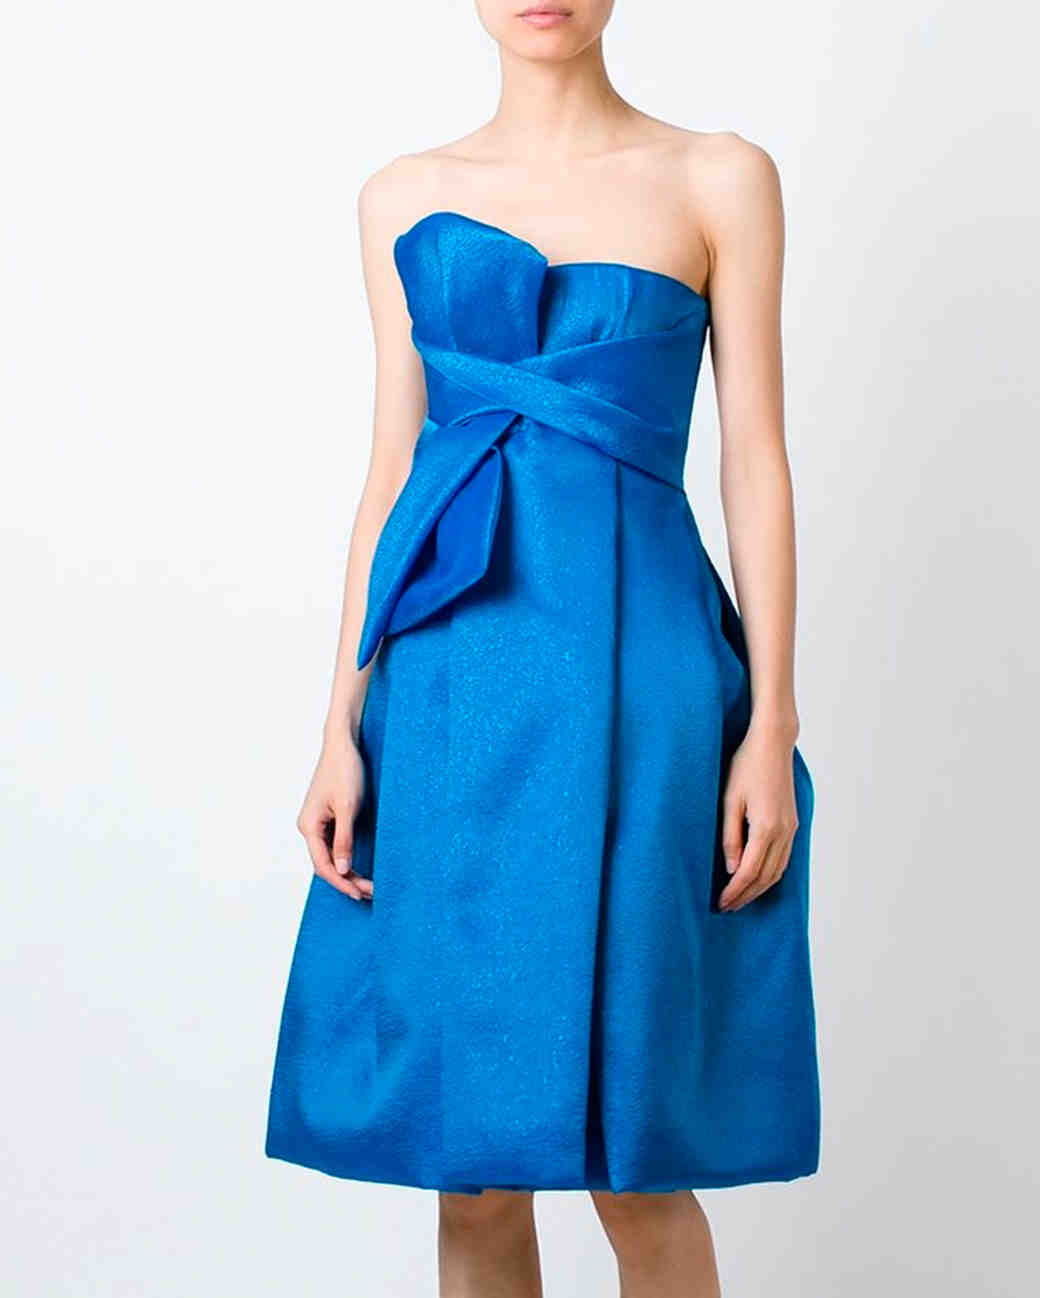 engagement-party-dresses-dsquared-farfetch-1215.jpg